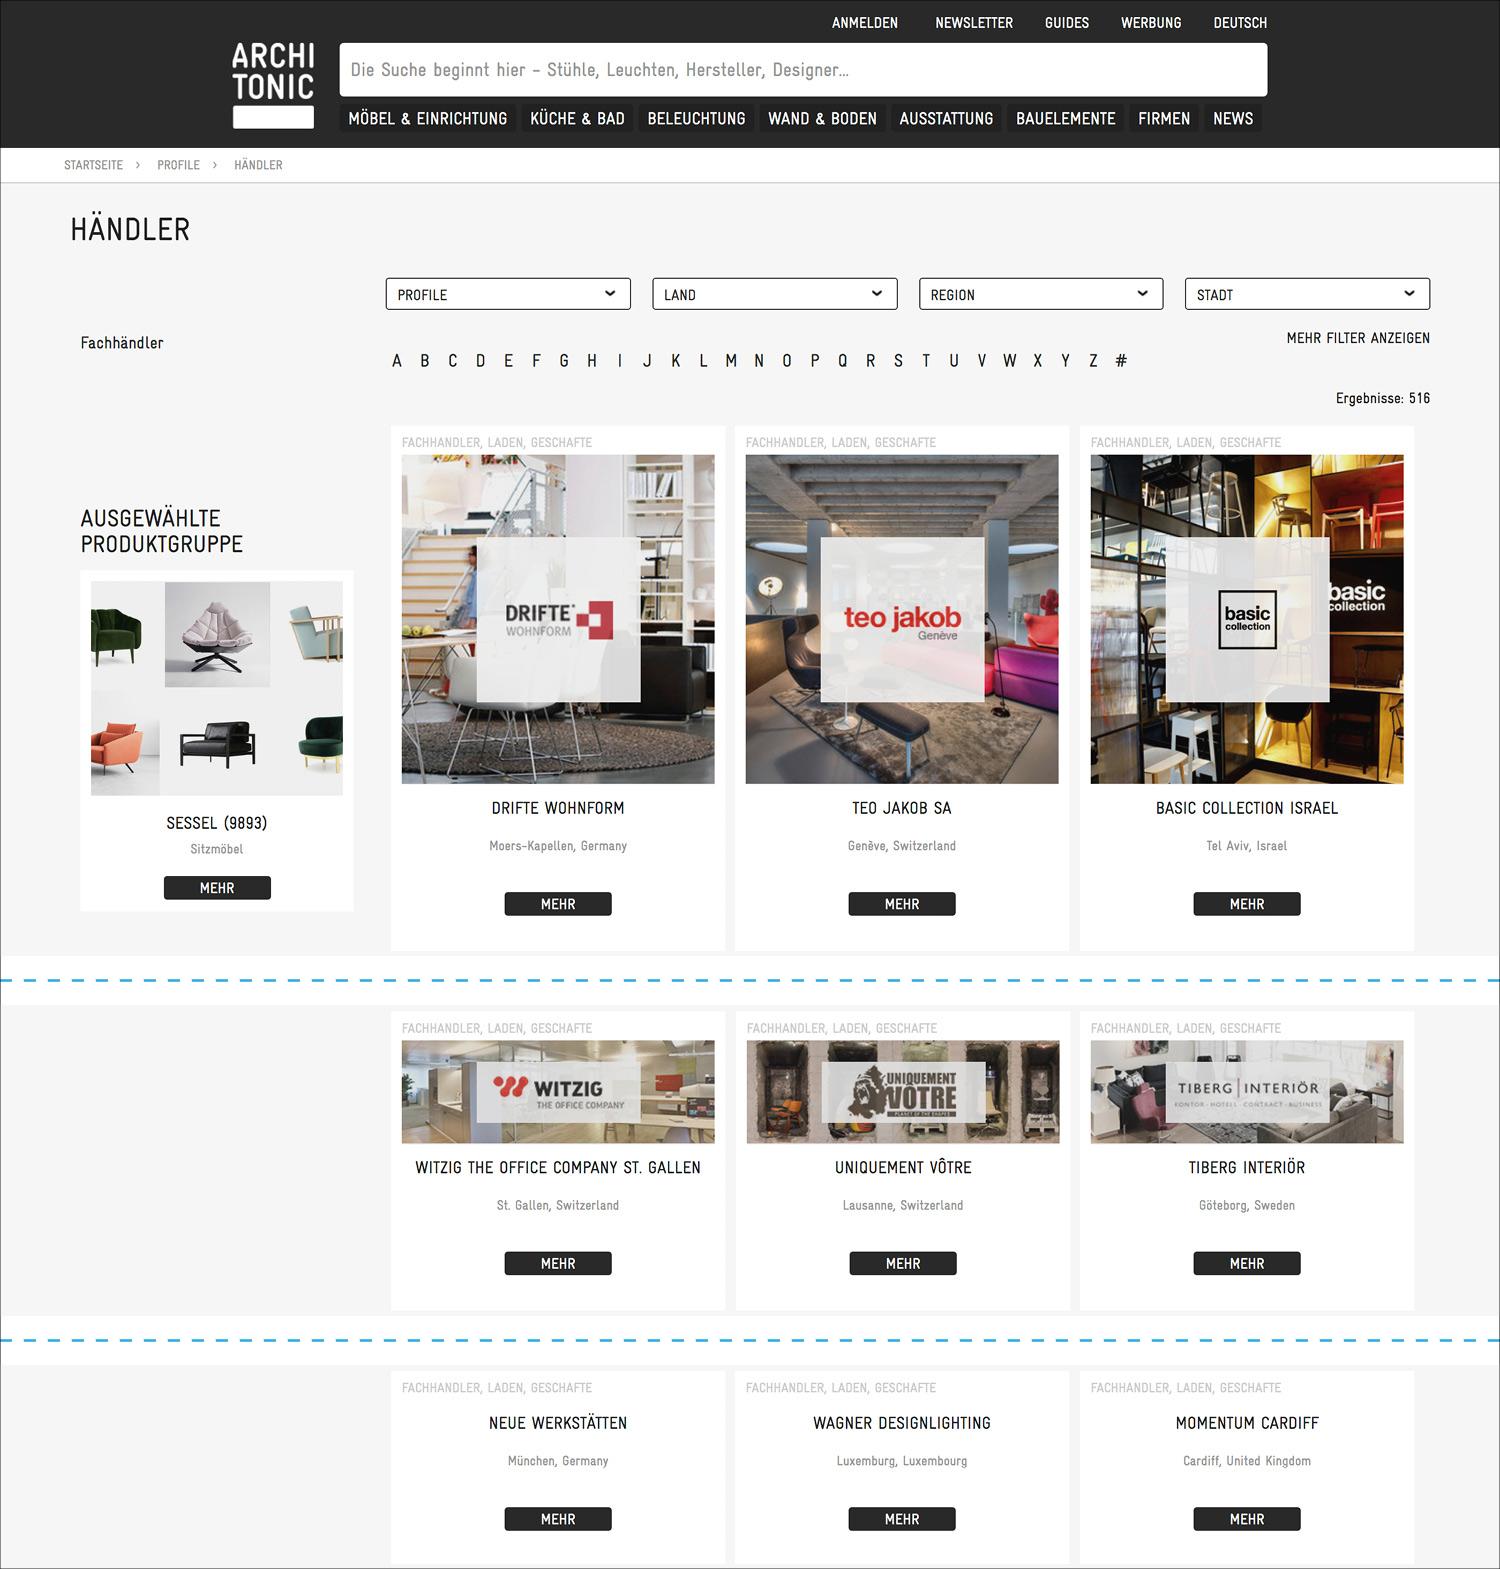 retailers_membership_listing_de.jpg